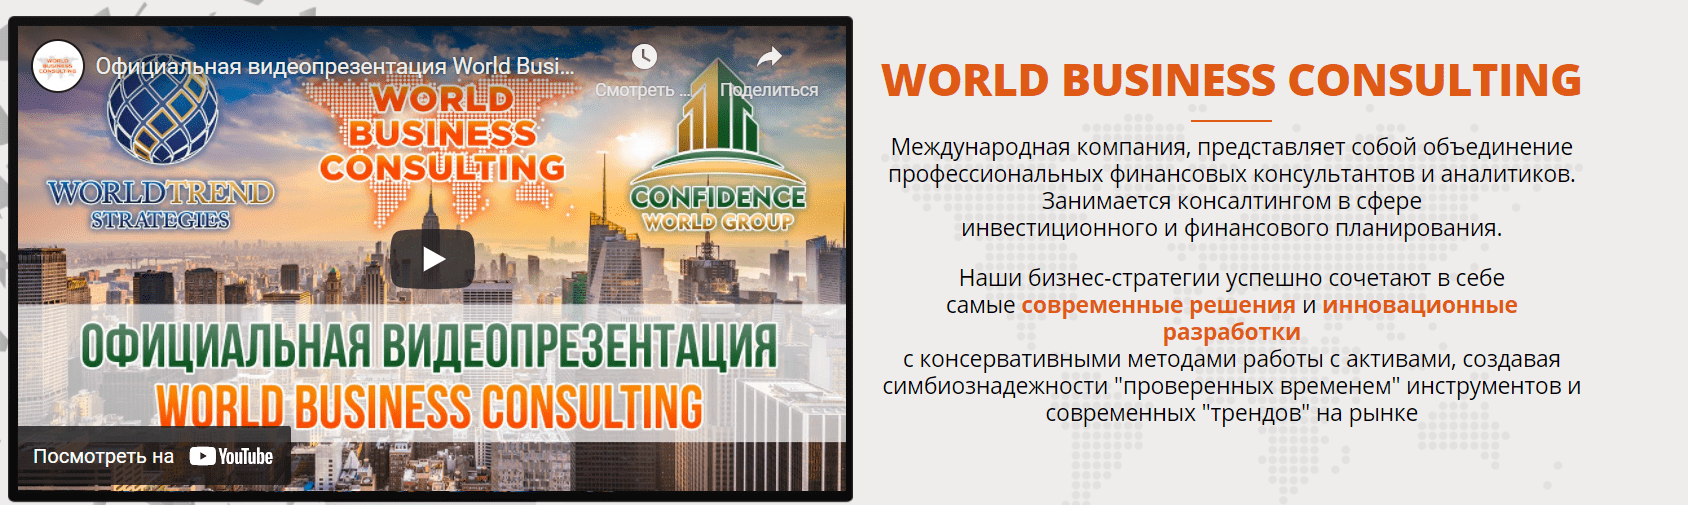 WBC-Corporation - МЛМ-лохотрон, Фото № 1 - 1-consult.net